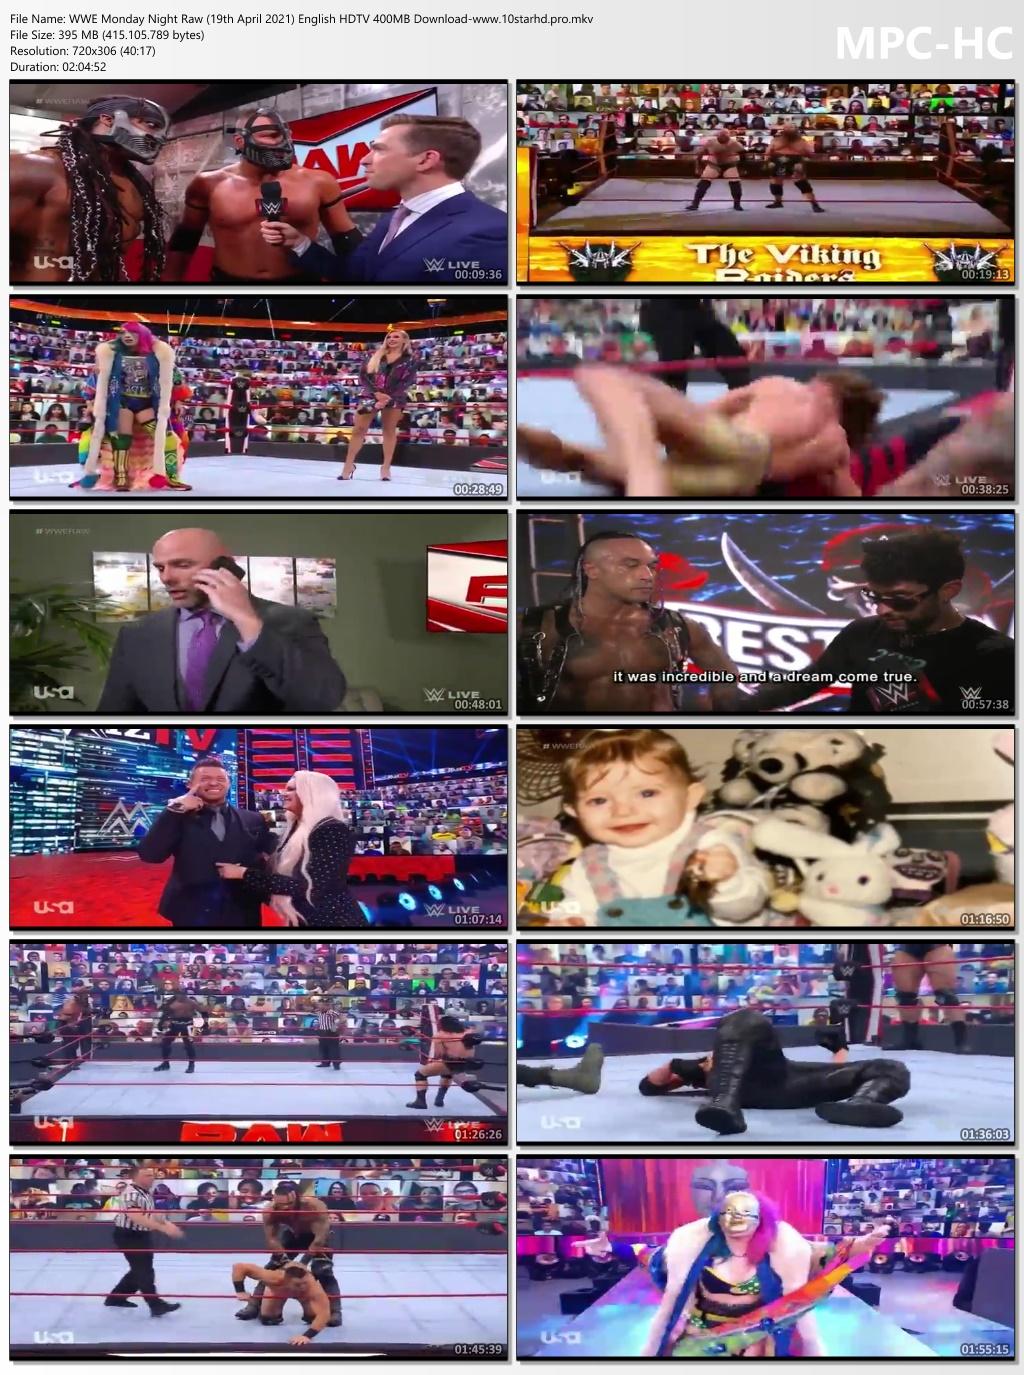 WWE Monday Night Raw (19th April 2021) English HDTV 395MB ...